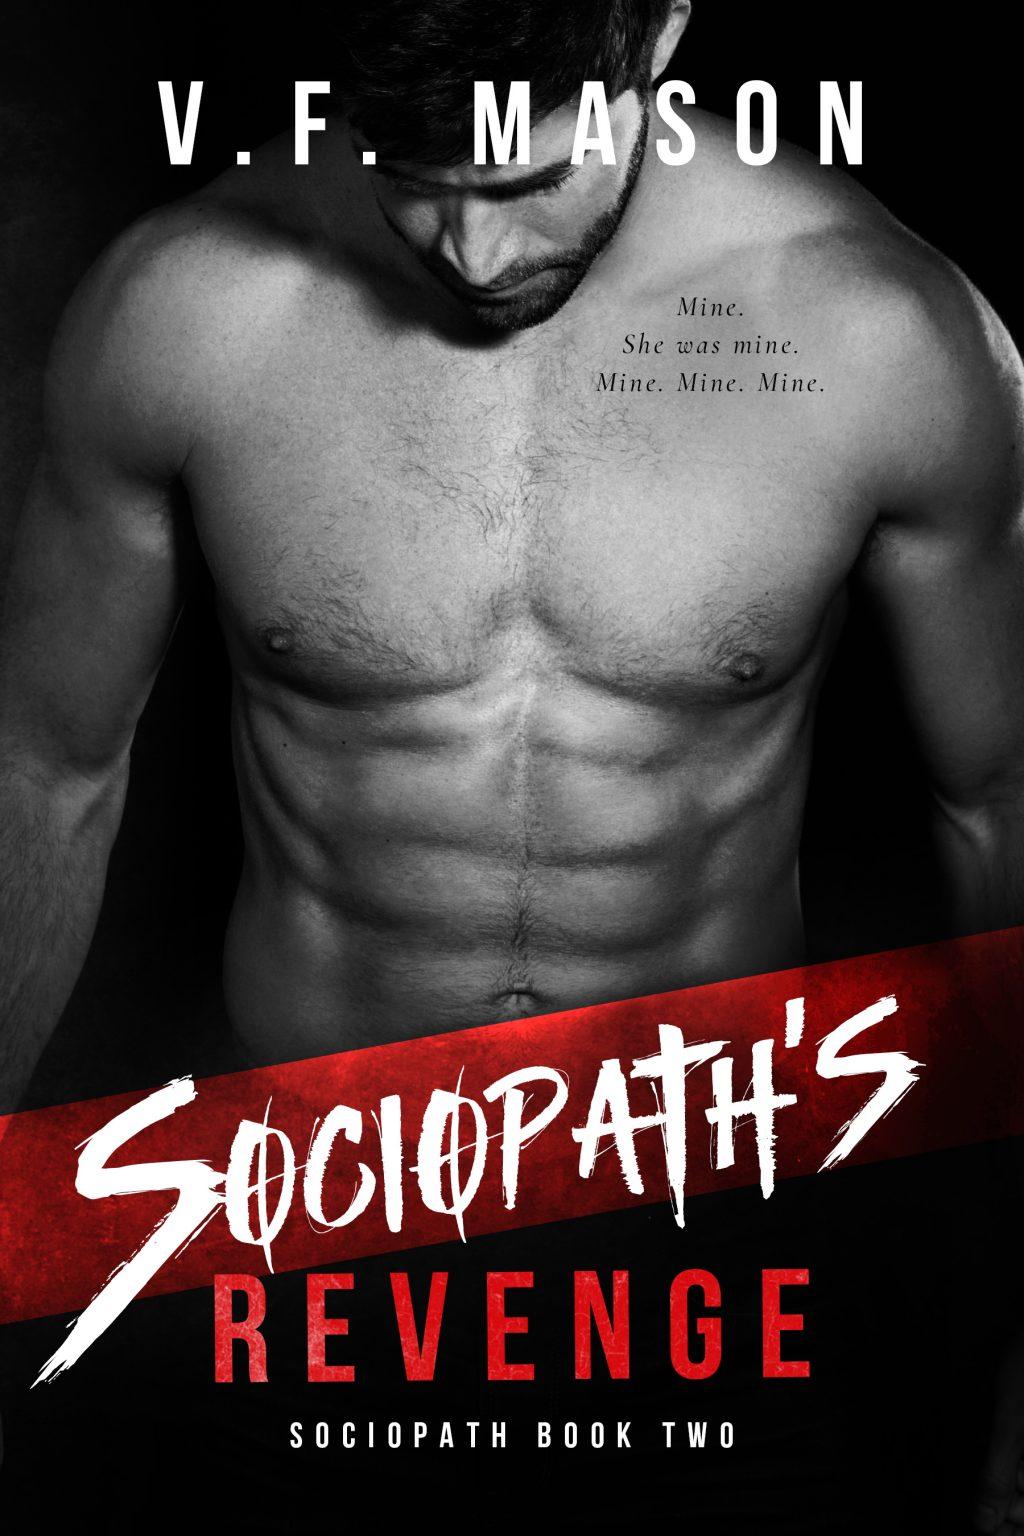 Sociopath's Revenge (Sociopath #2) by V.F. Mason